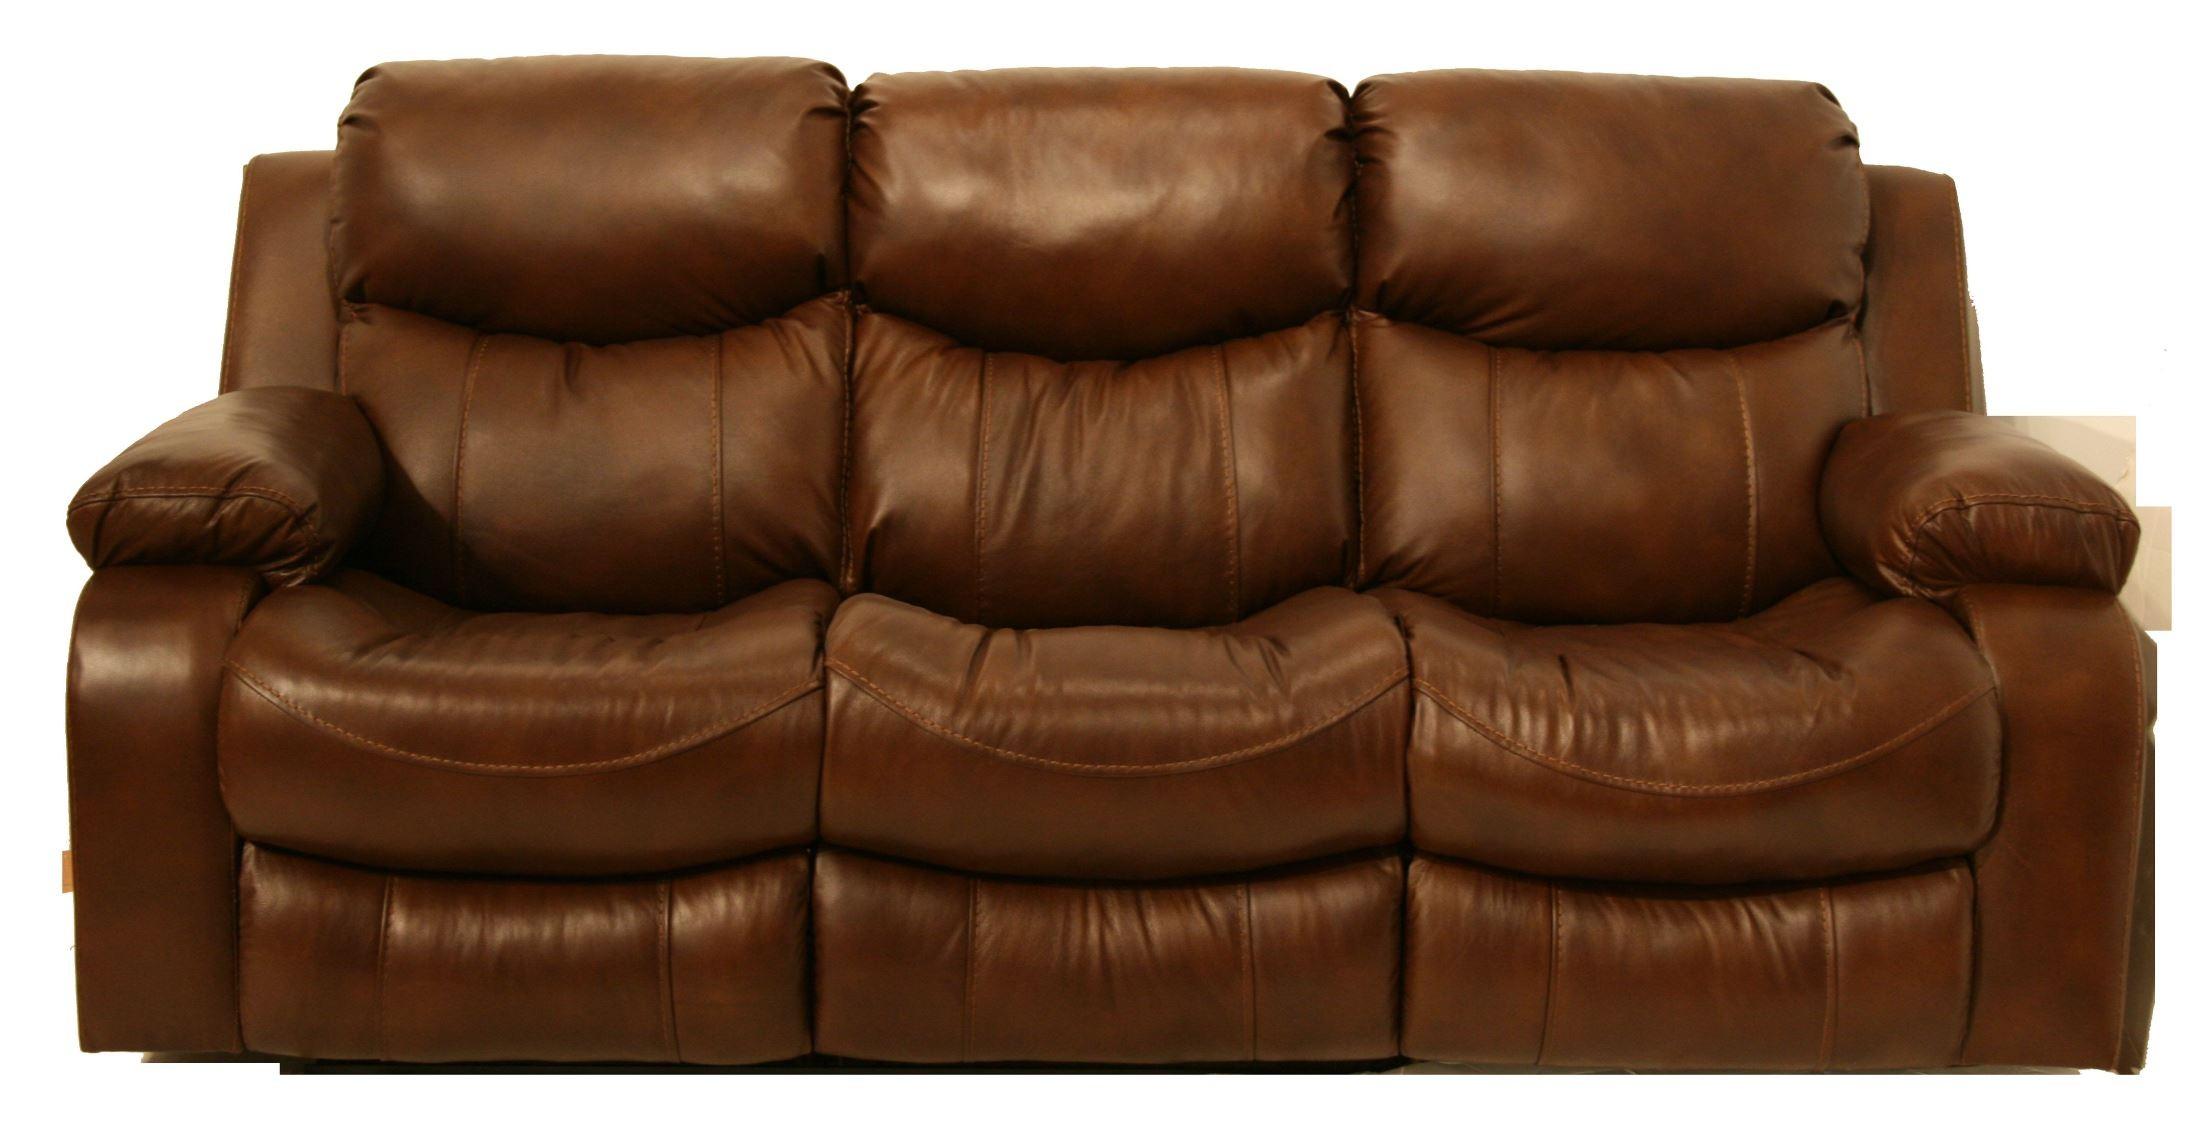 power reclining sofa made in usa traducir cama en ingles dallas tobacco from catnapper